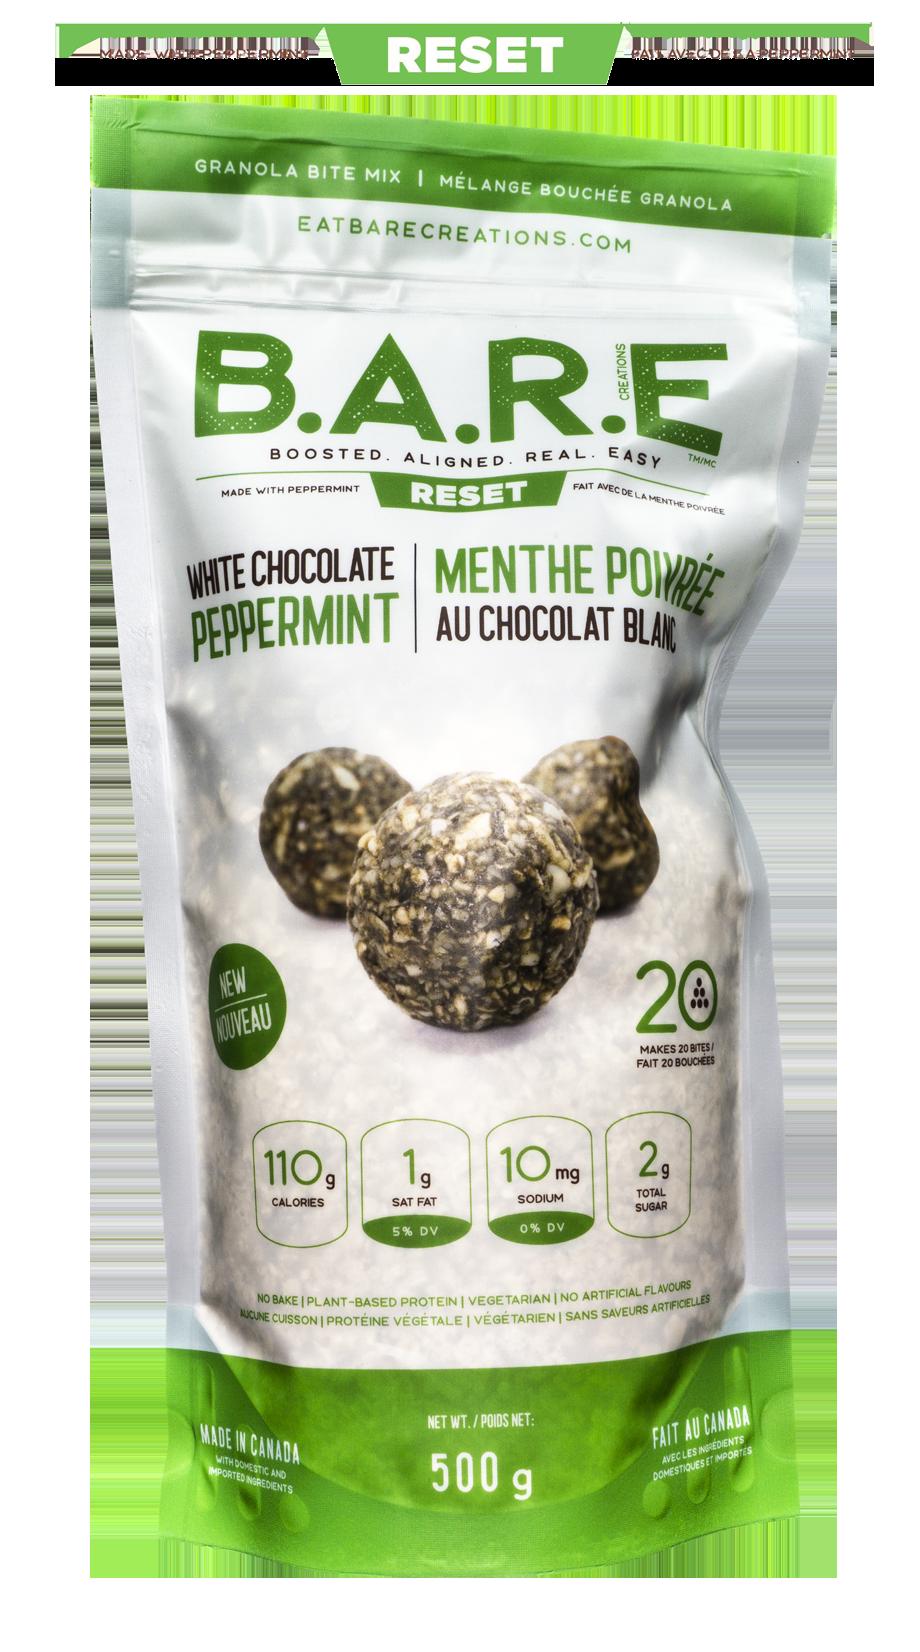 White Chocolate Peppermint Granola Bite Bar Mix